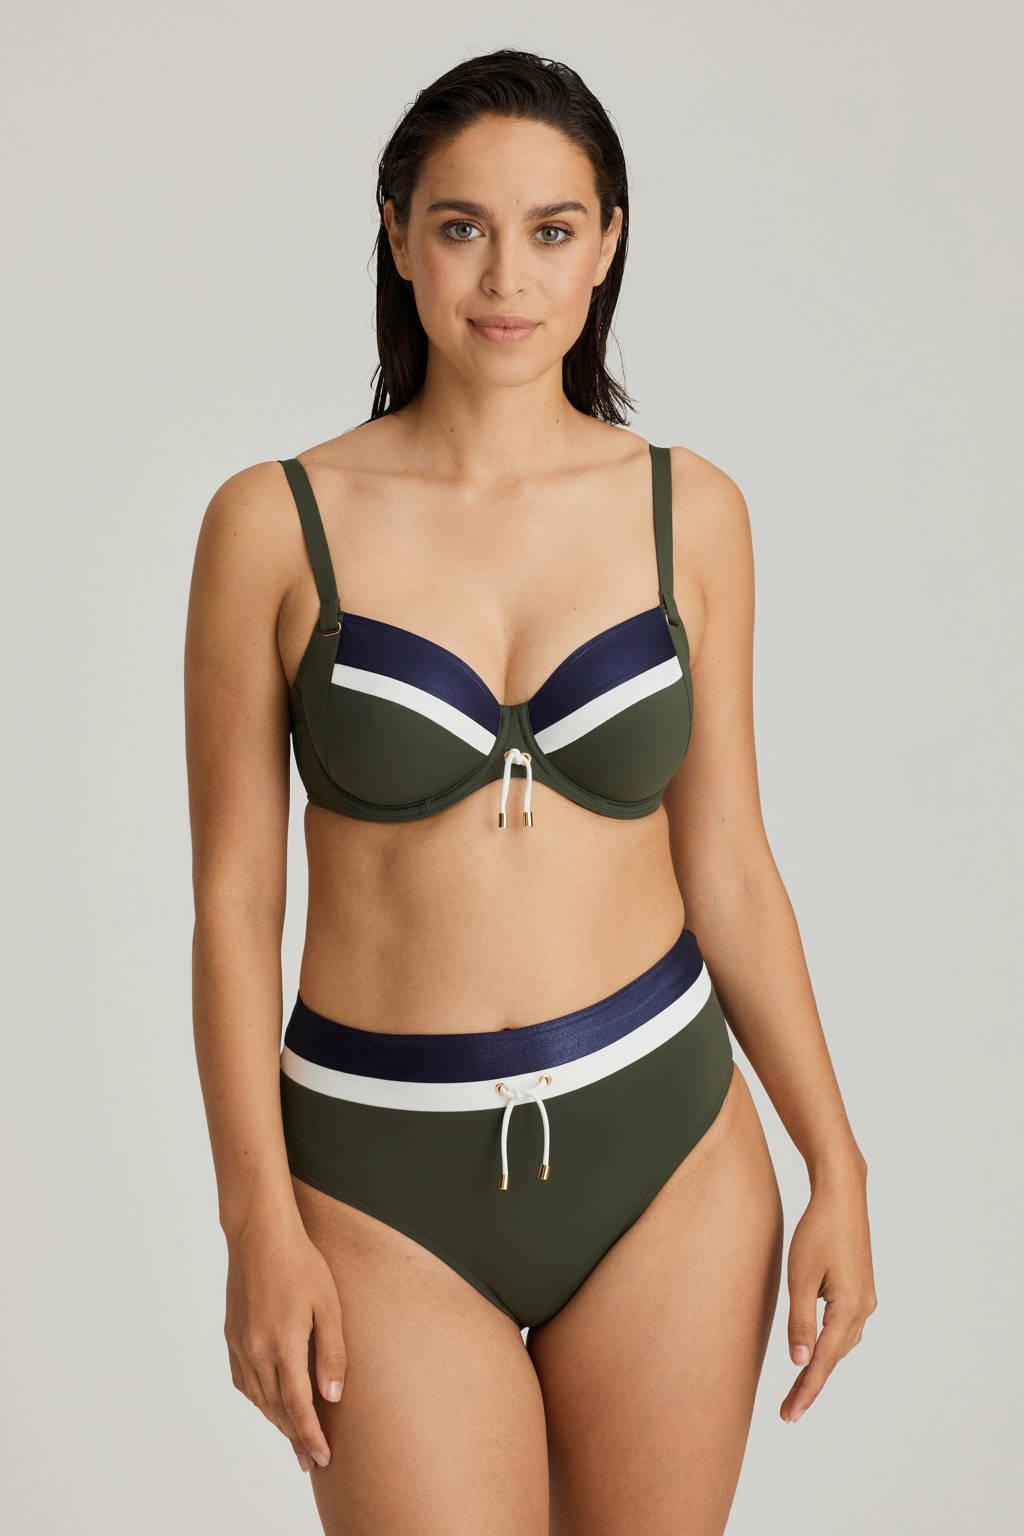 PrimaDonna high waist bikinibroekje Ocean Drive groen, Blauw / kaki / wit